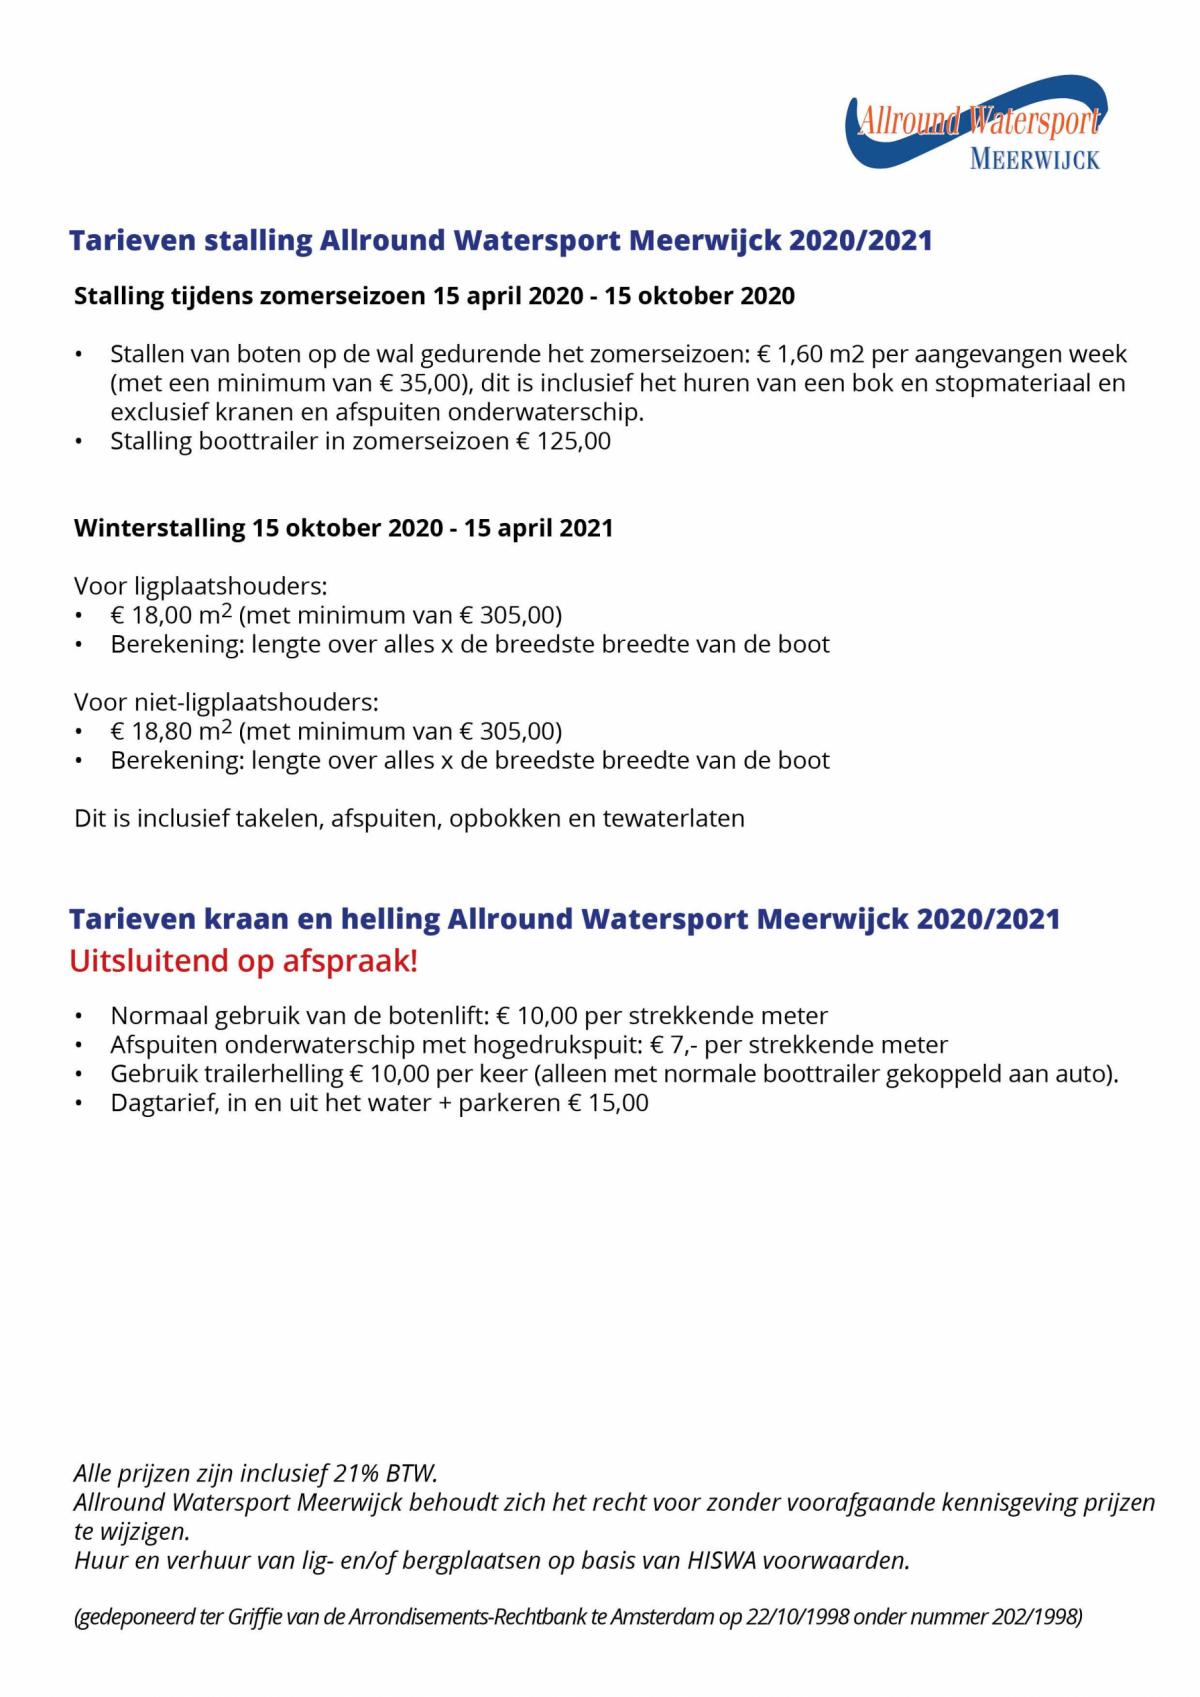 Tarieven-stalling-2020-en-2021-Allround-Watersport-Meerwijck-te-Kropswolde